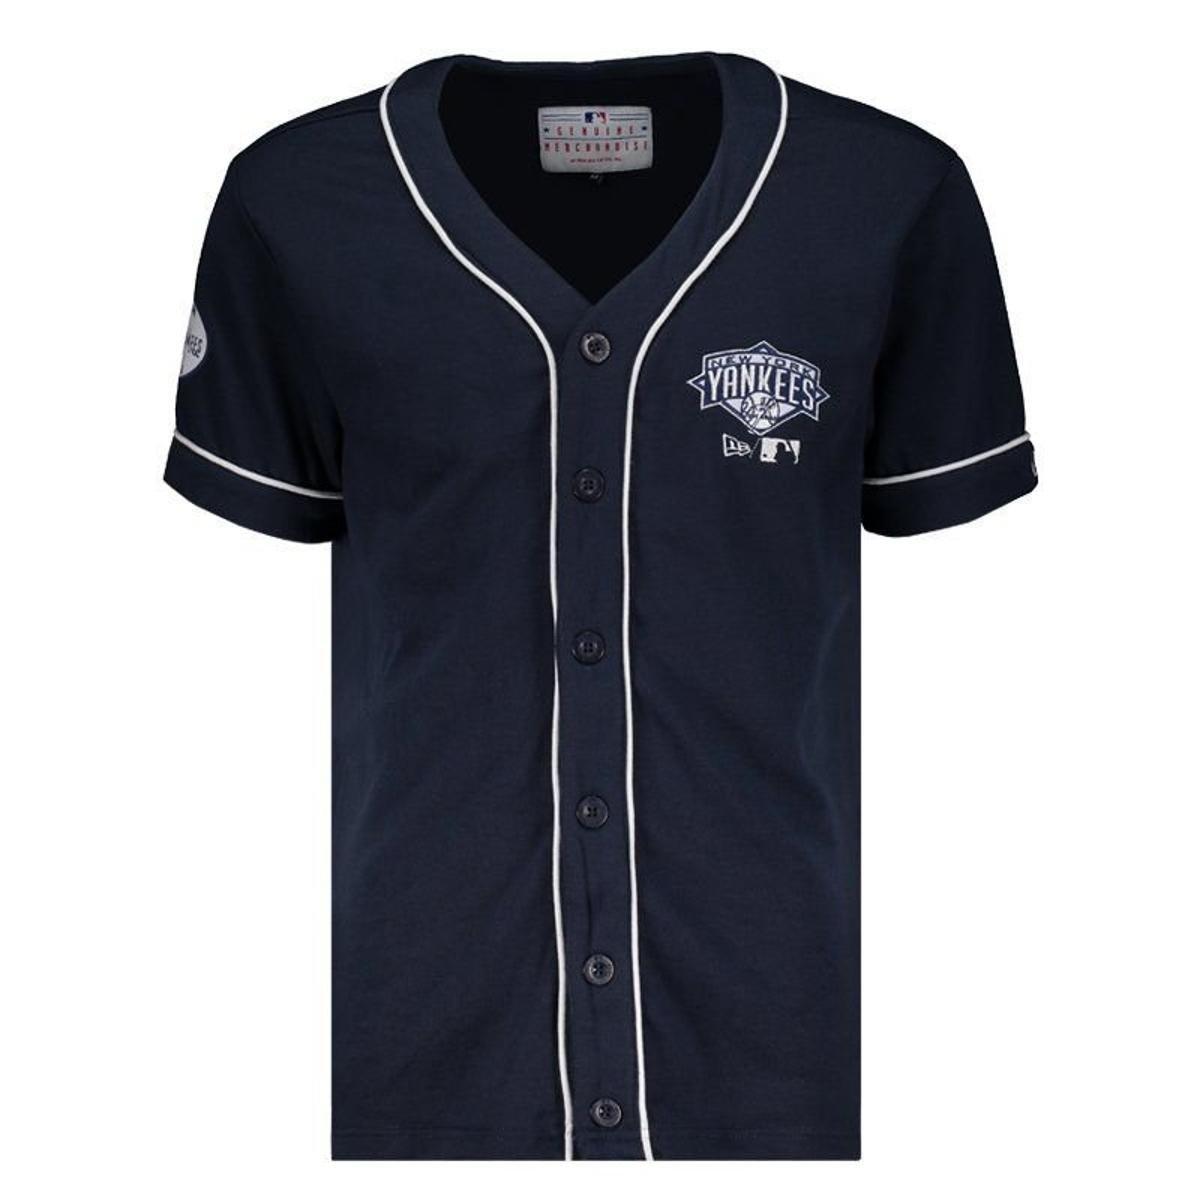 f468e935fecce Camisa New Era MLB New York Yankees Masculina - Marinho - Compre Agora